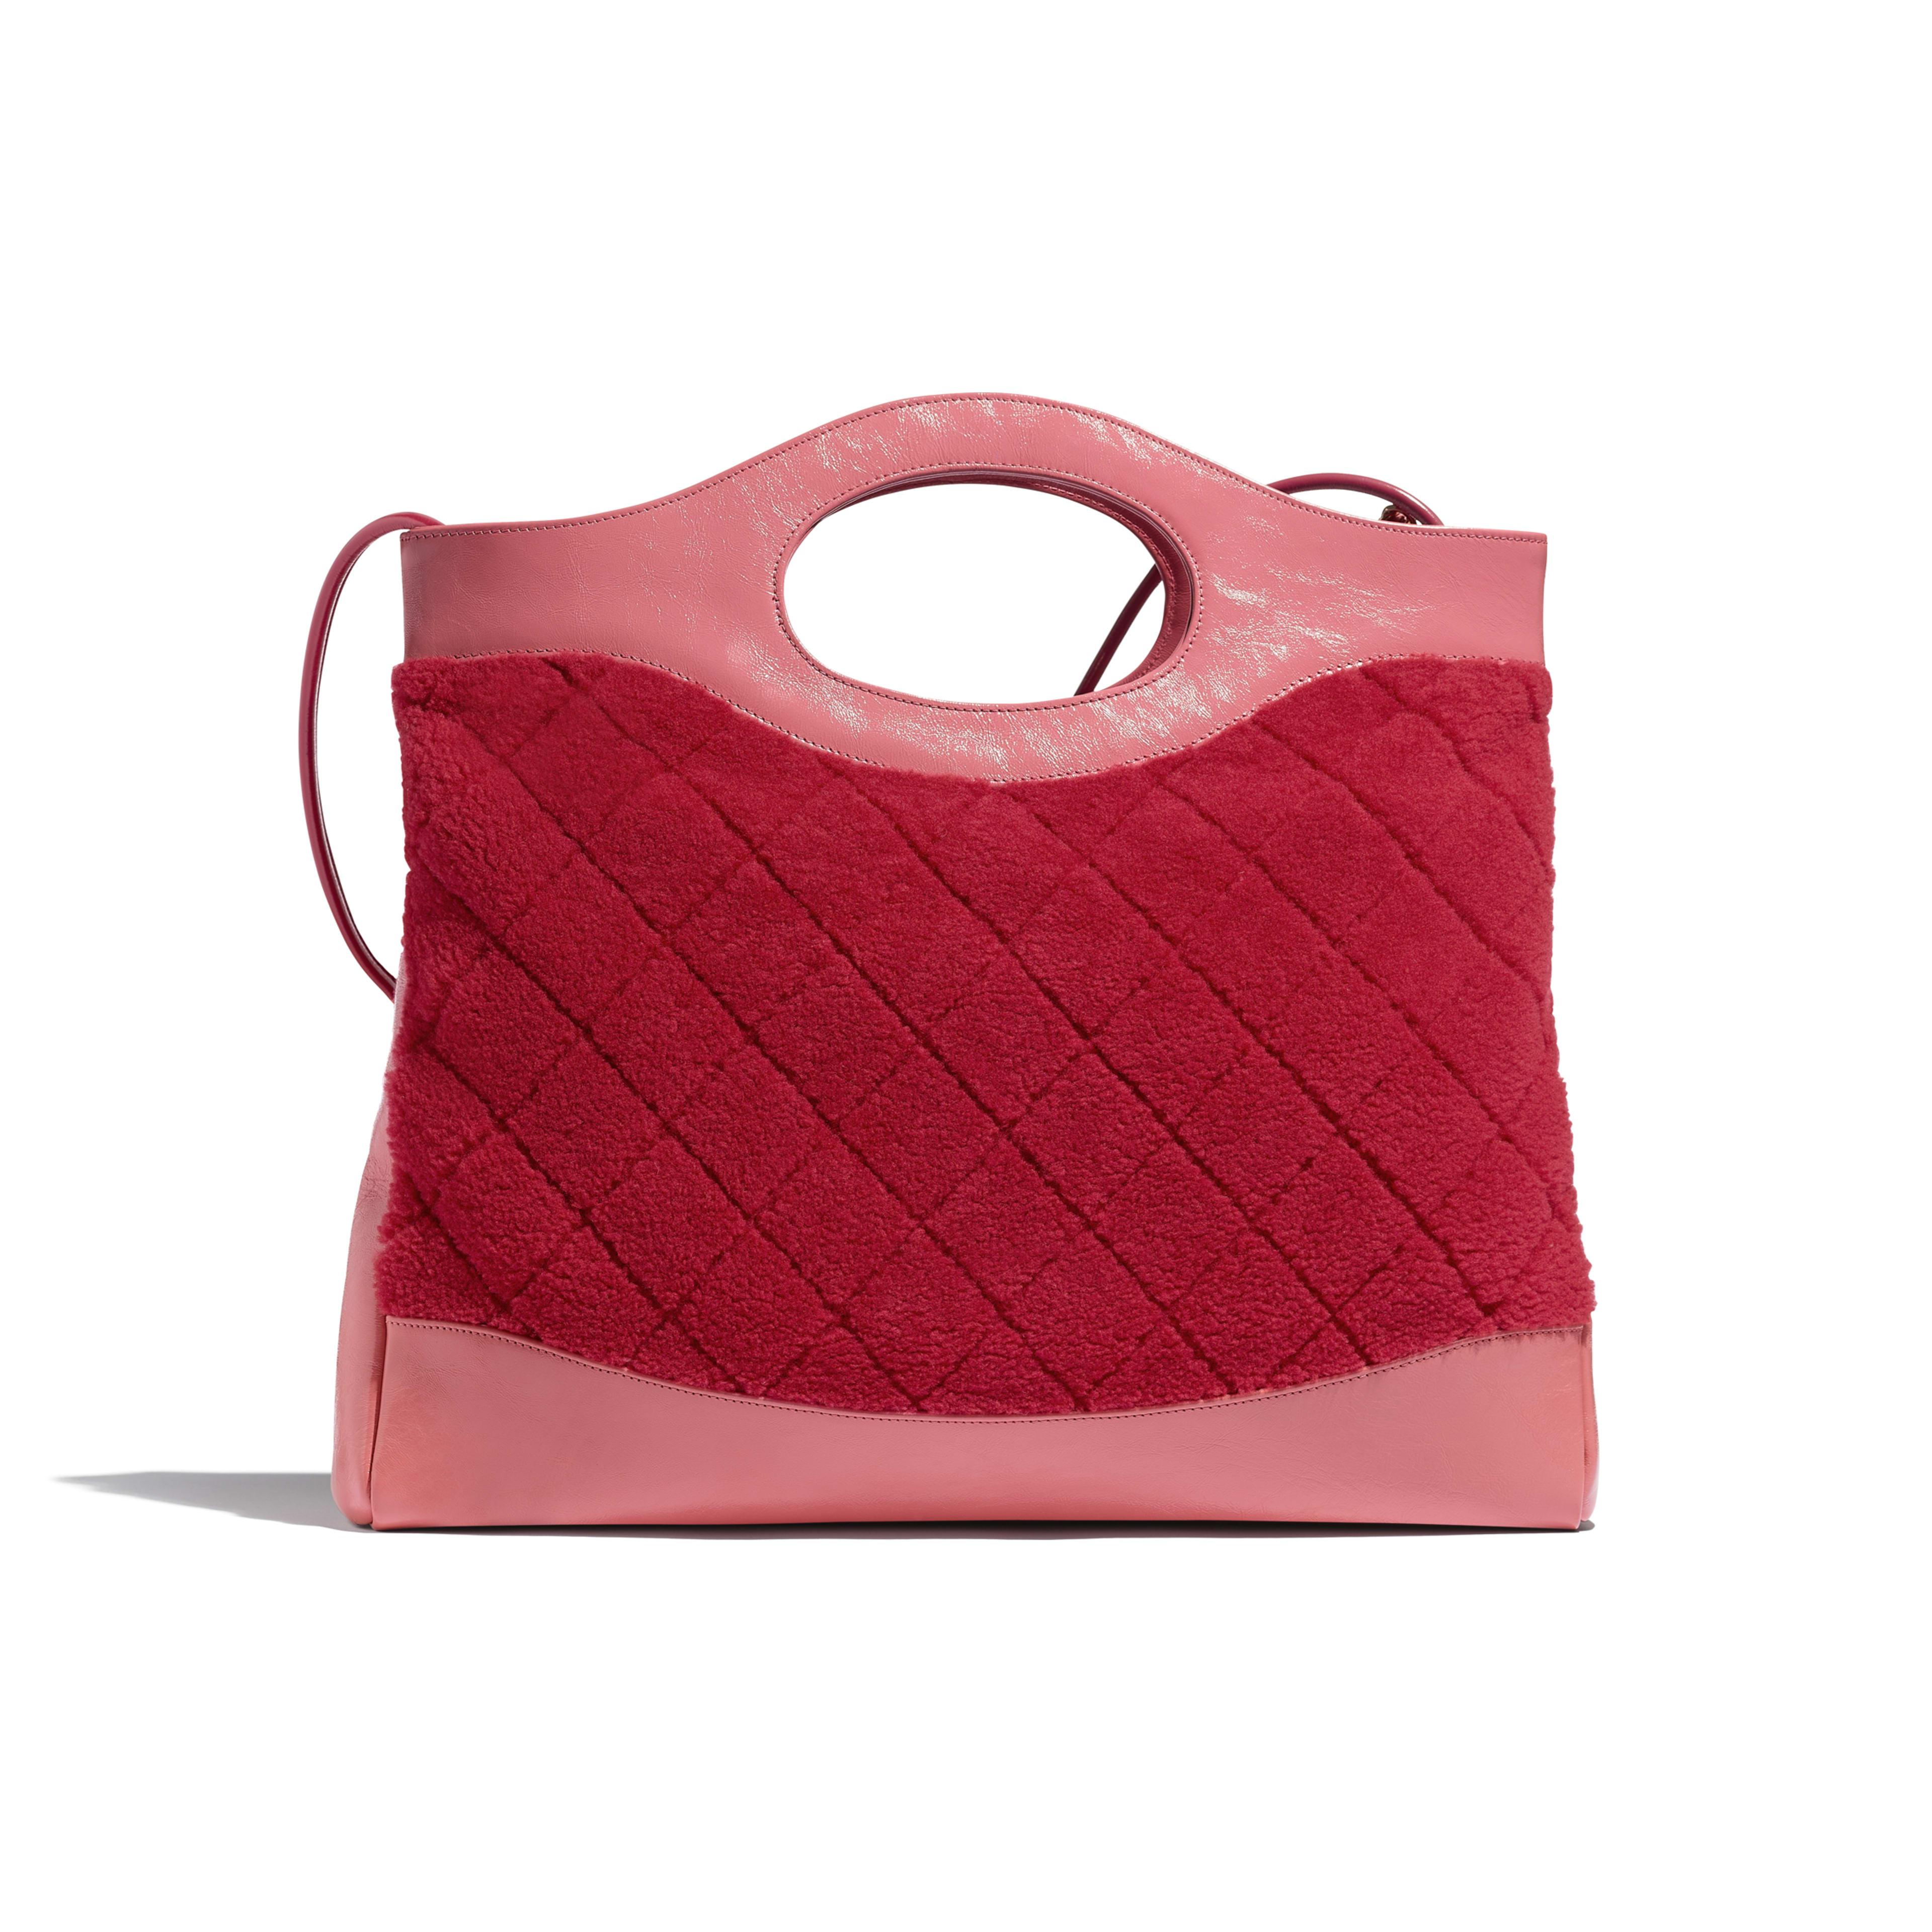 CHANEL 31 Shopping Bag - Red & Pink - Shearling Sheepskin, Calfskin & Gold-Tone Metal - Alternative view - see full sized version